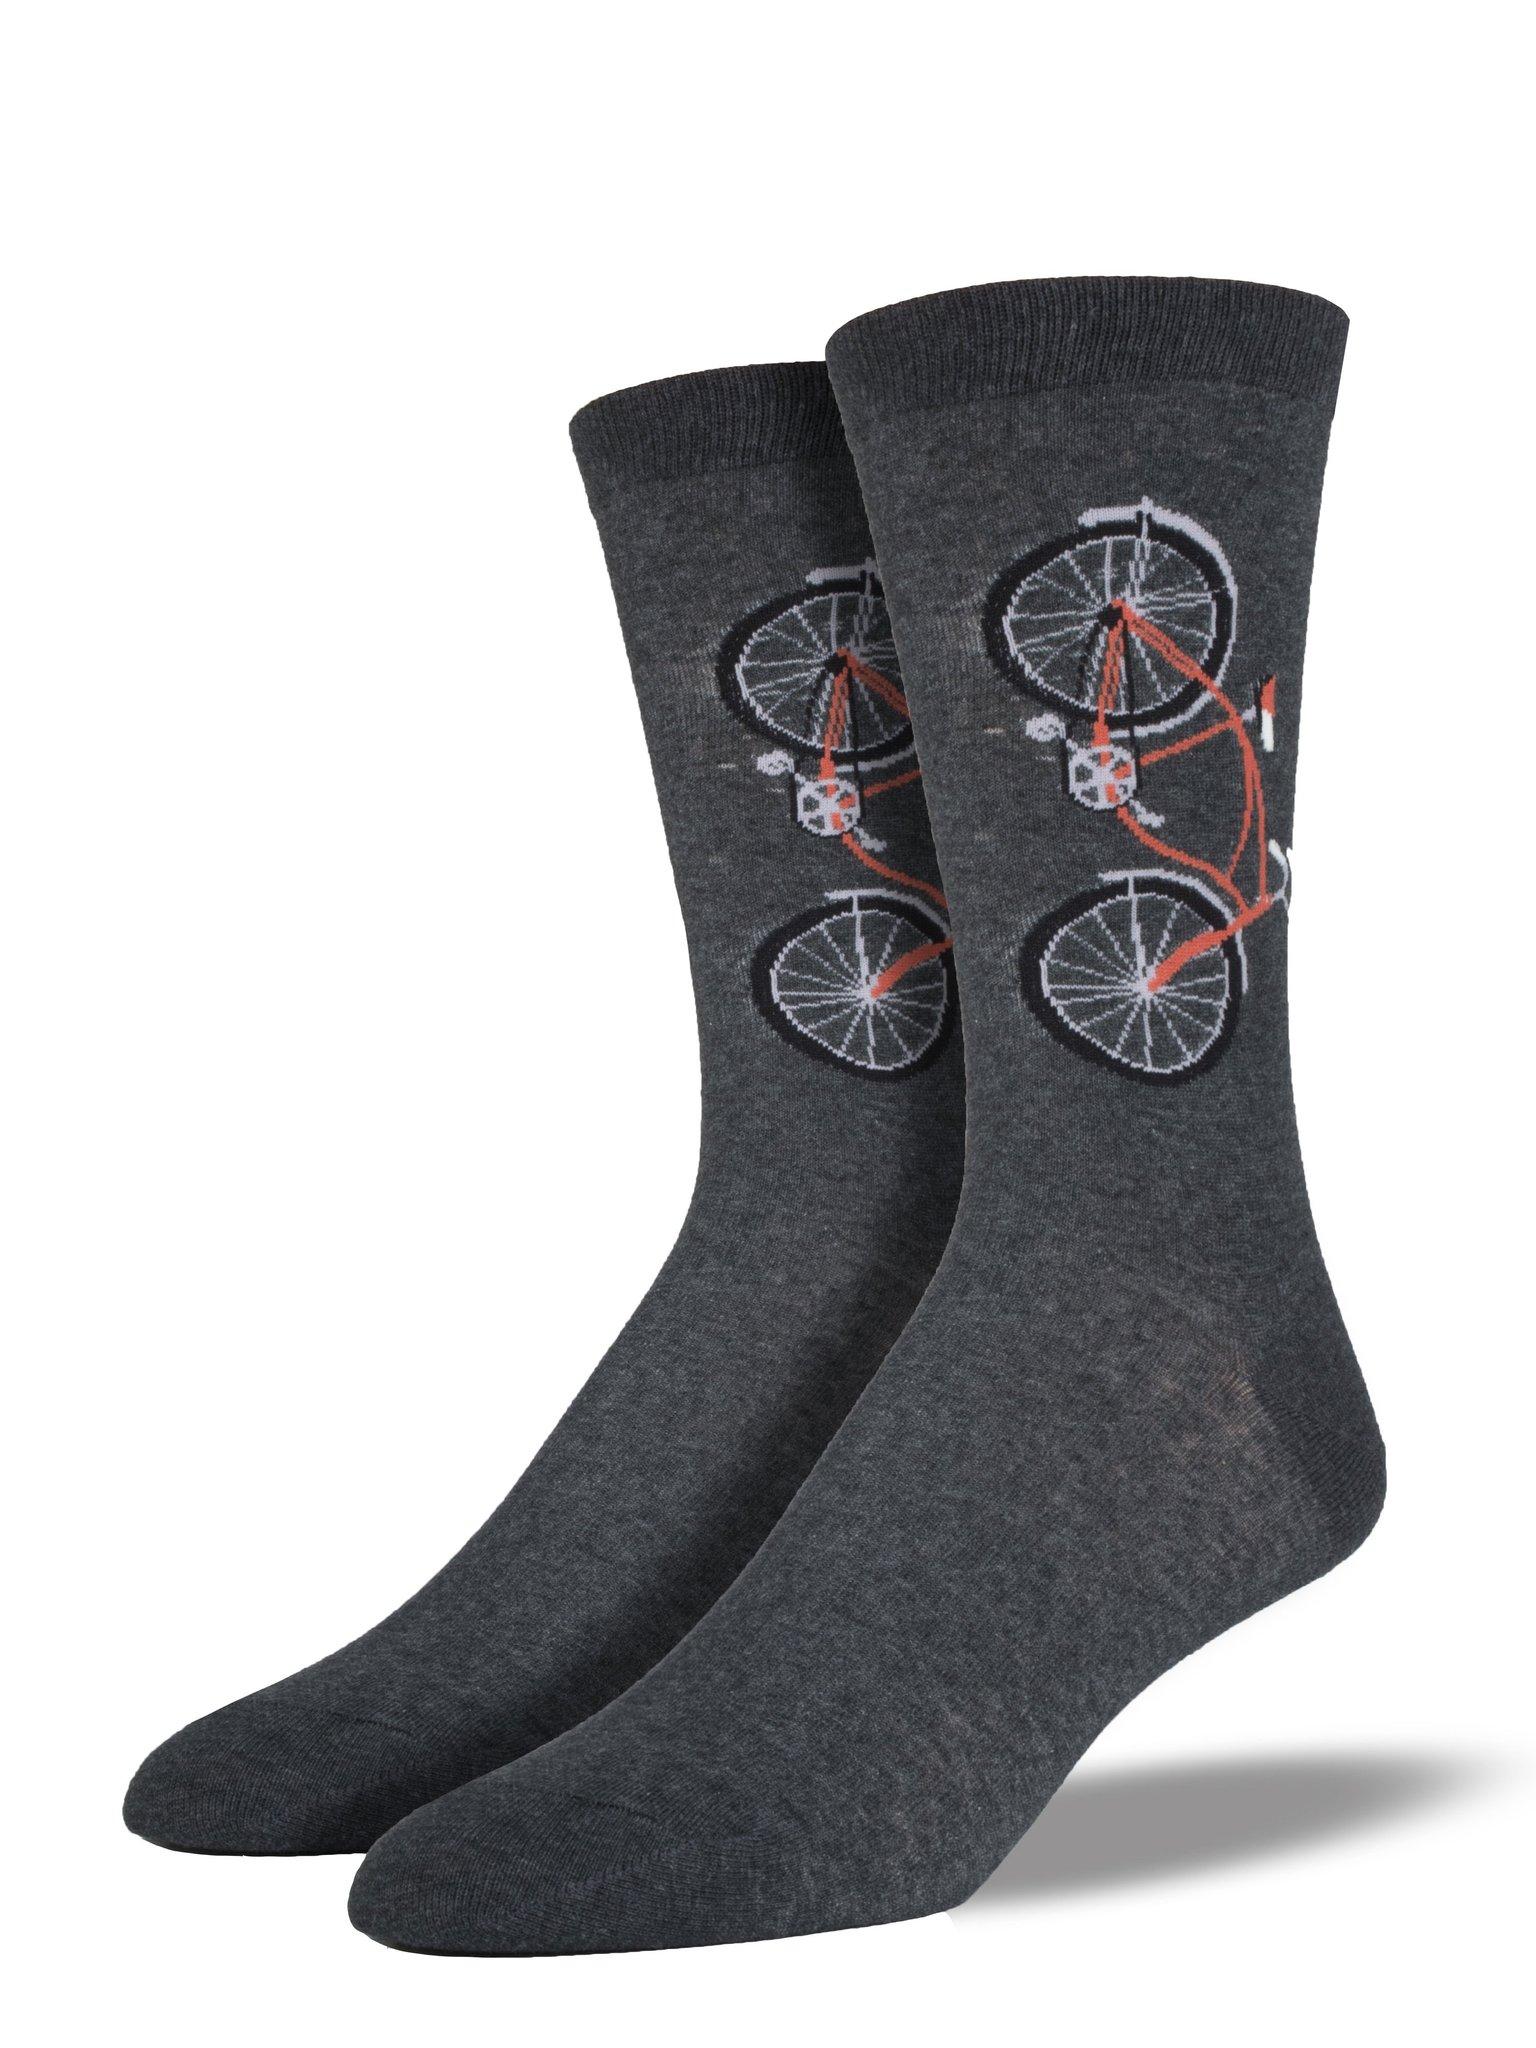 socksmith-design-mens-bicycle-socks-charcoal.jpg